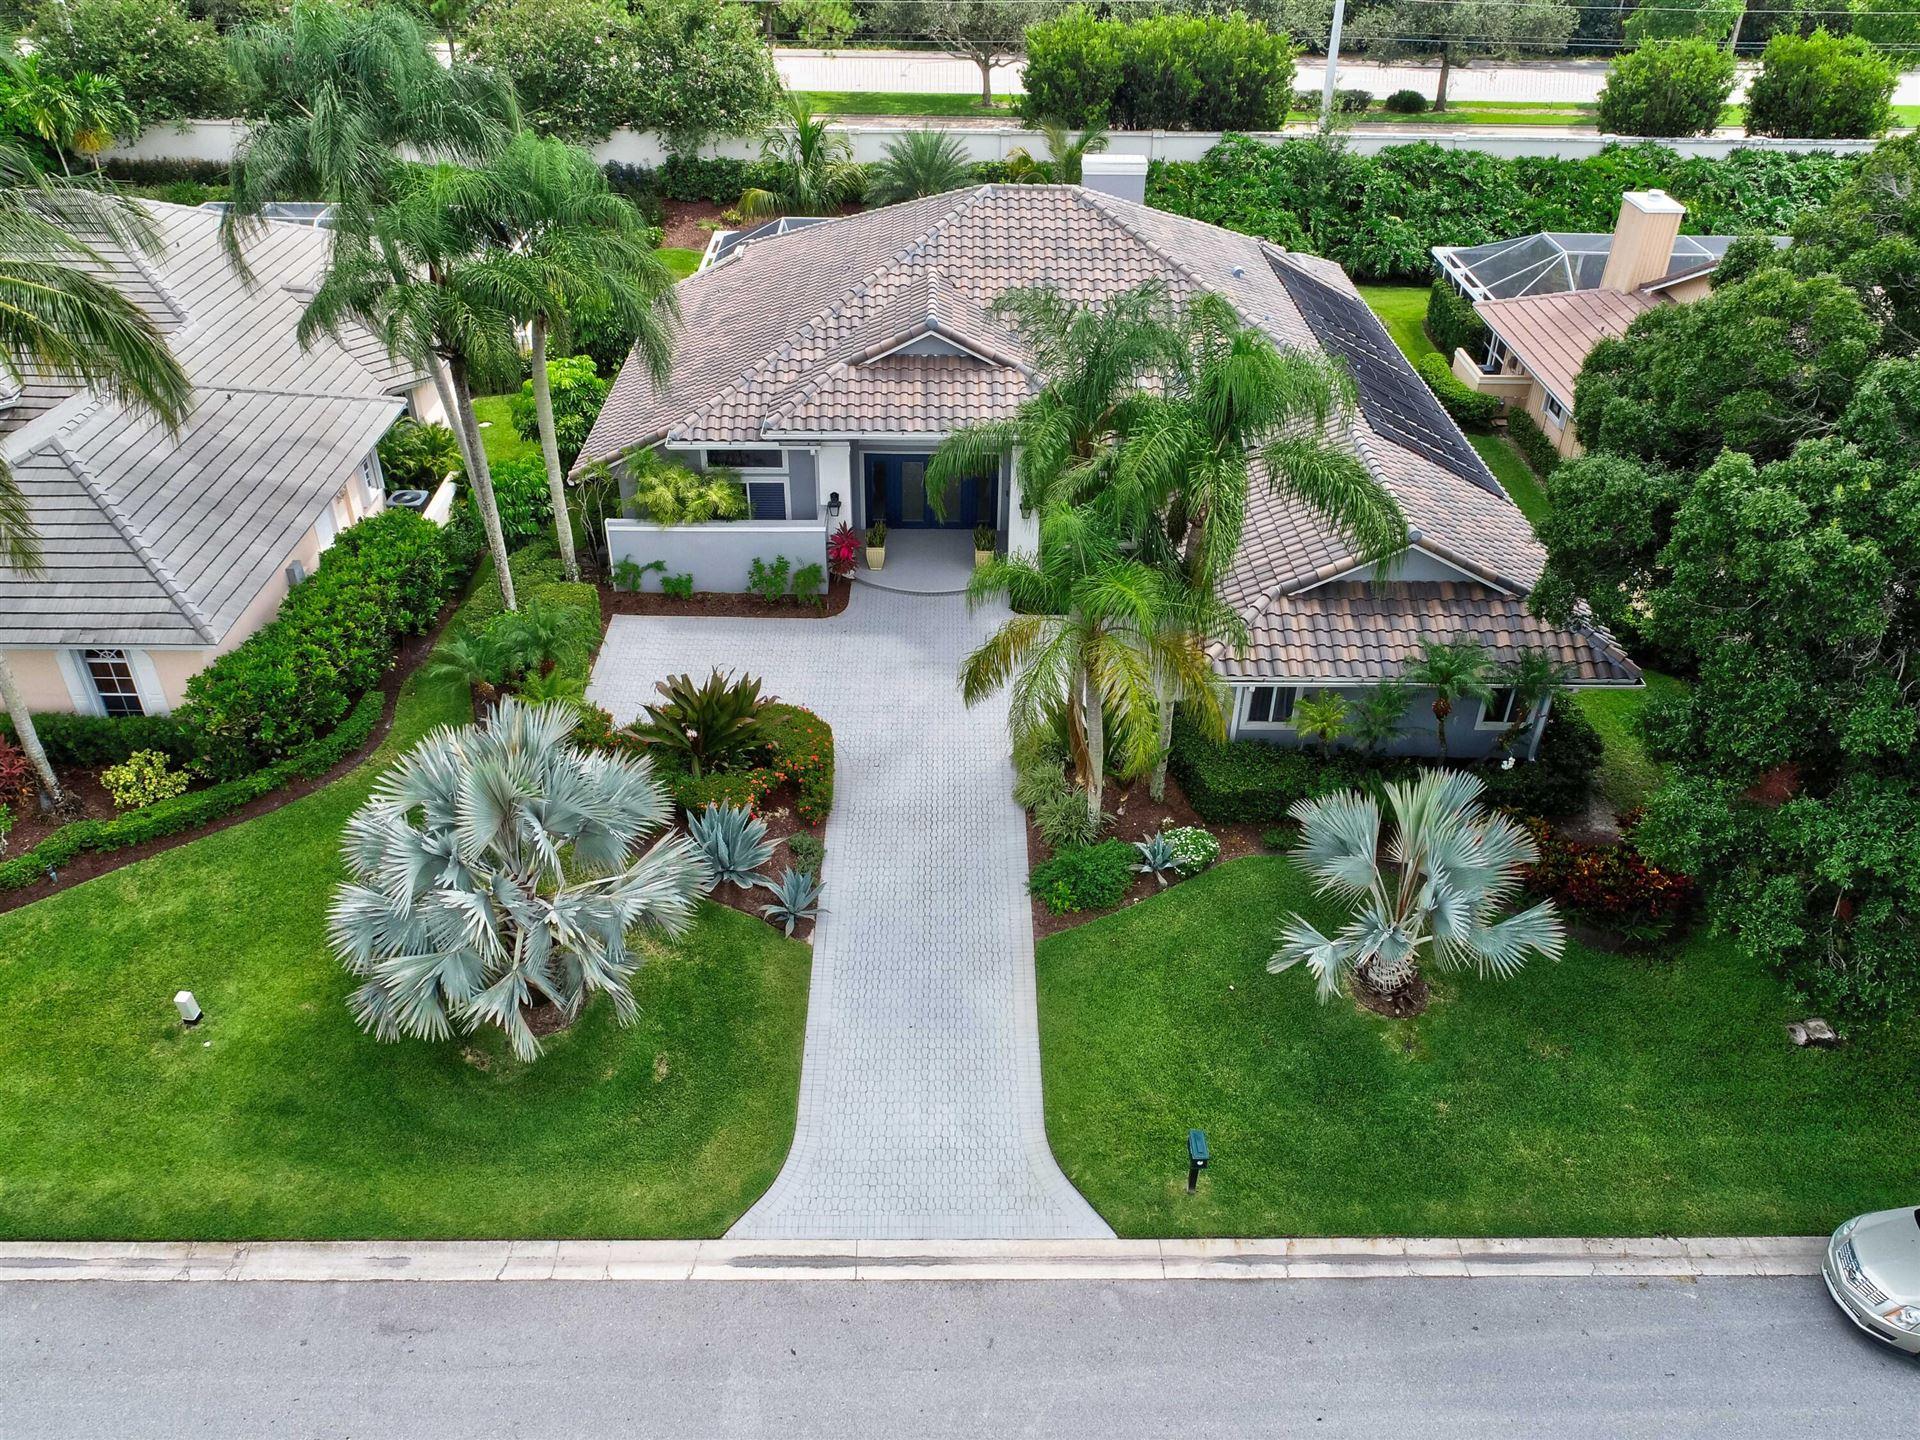 Photo of 140 Thornton Drive, Palm Beach Gardens, FL 33418 (MLS # RX-10743750)